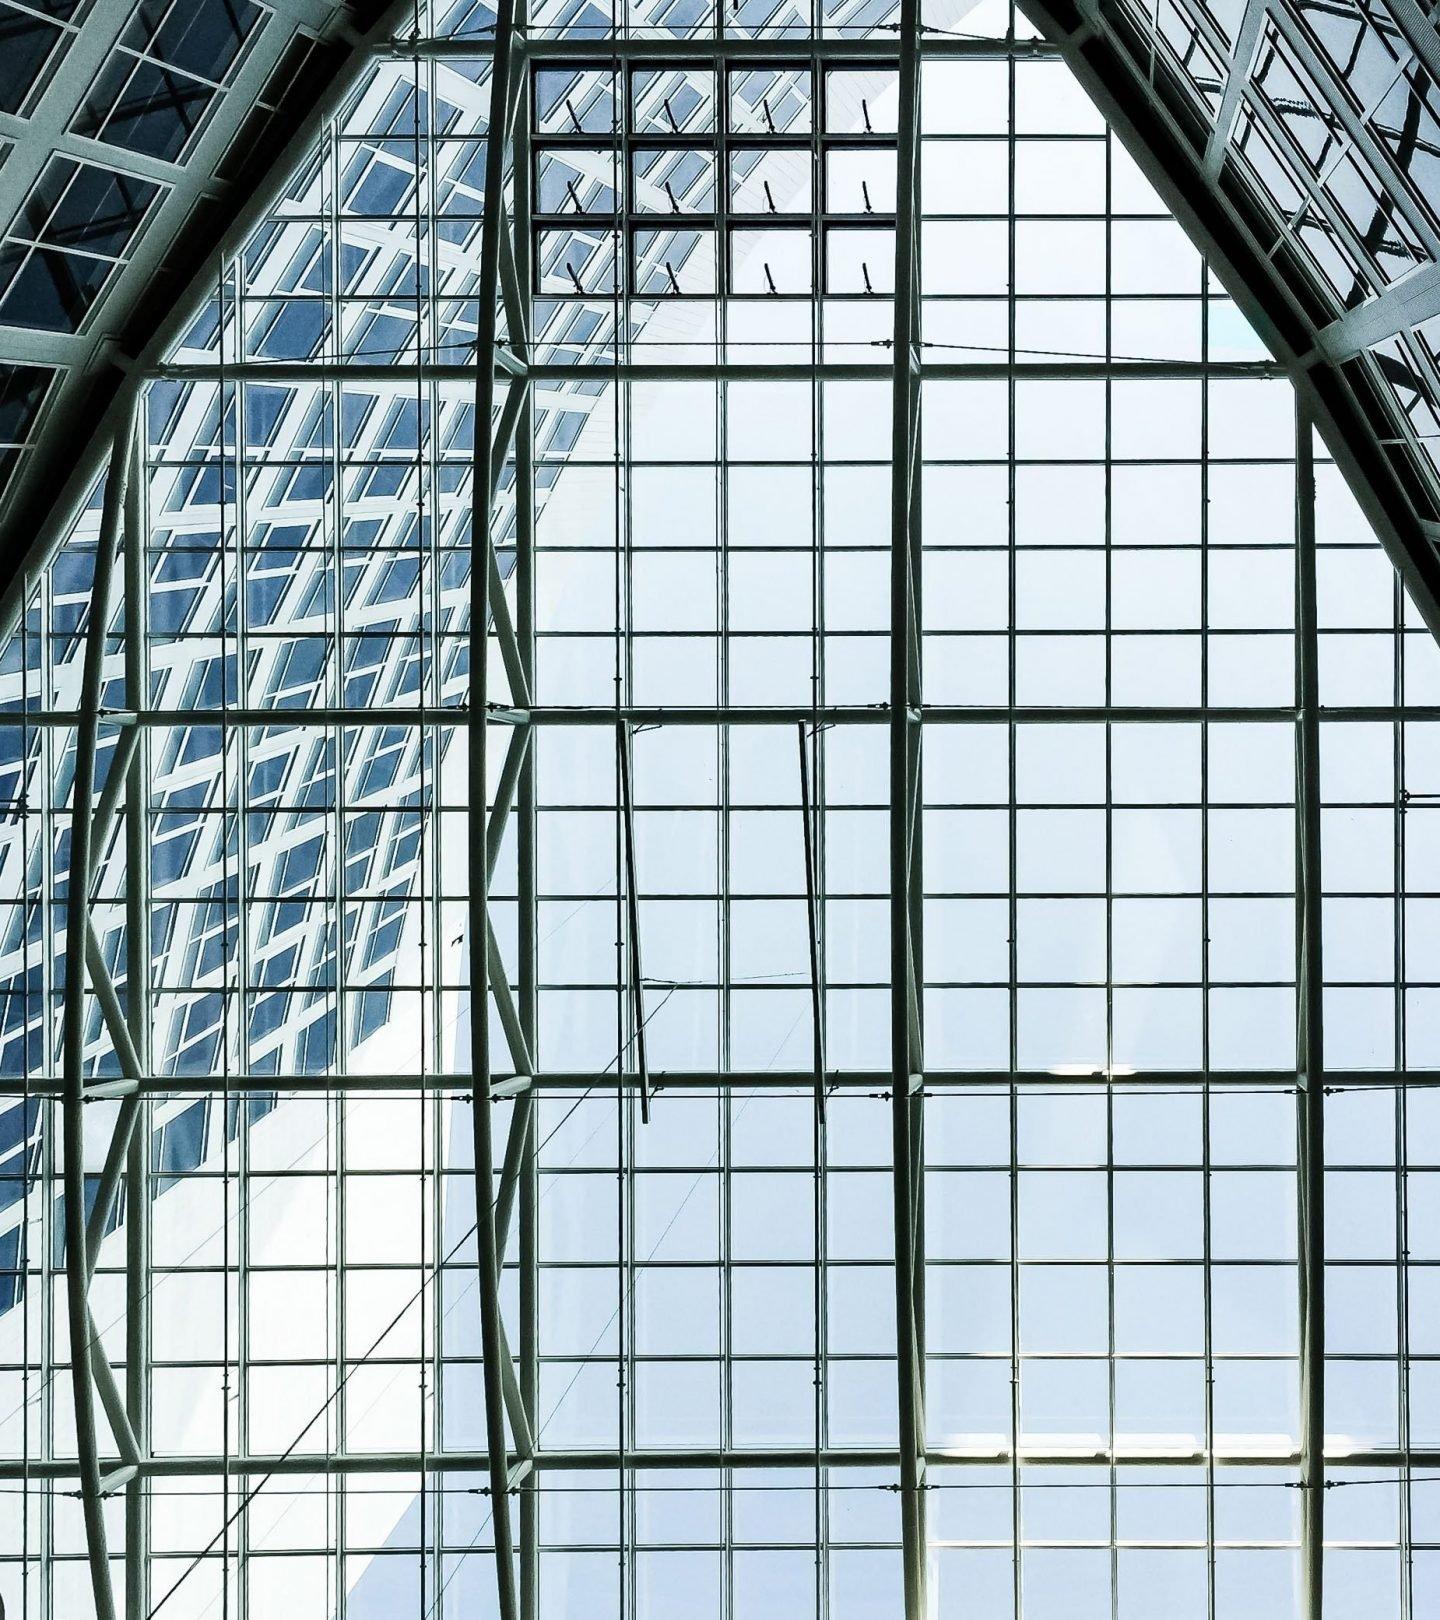 Marten Meesweg Rotterdam - Glasdach